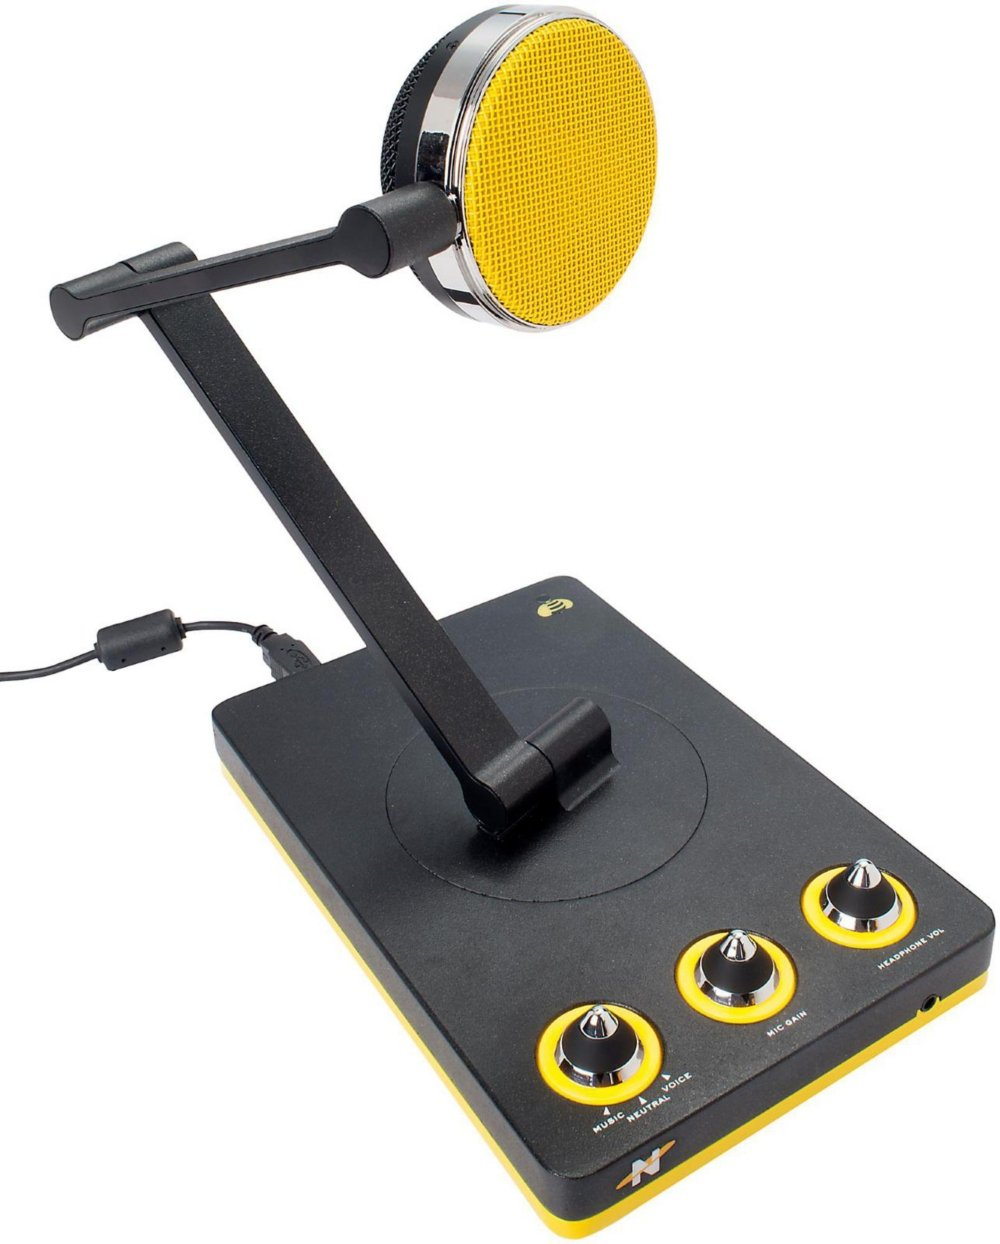 NEAT Bumblebee Desktop USB Microphone MIC-BBDU